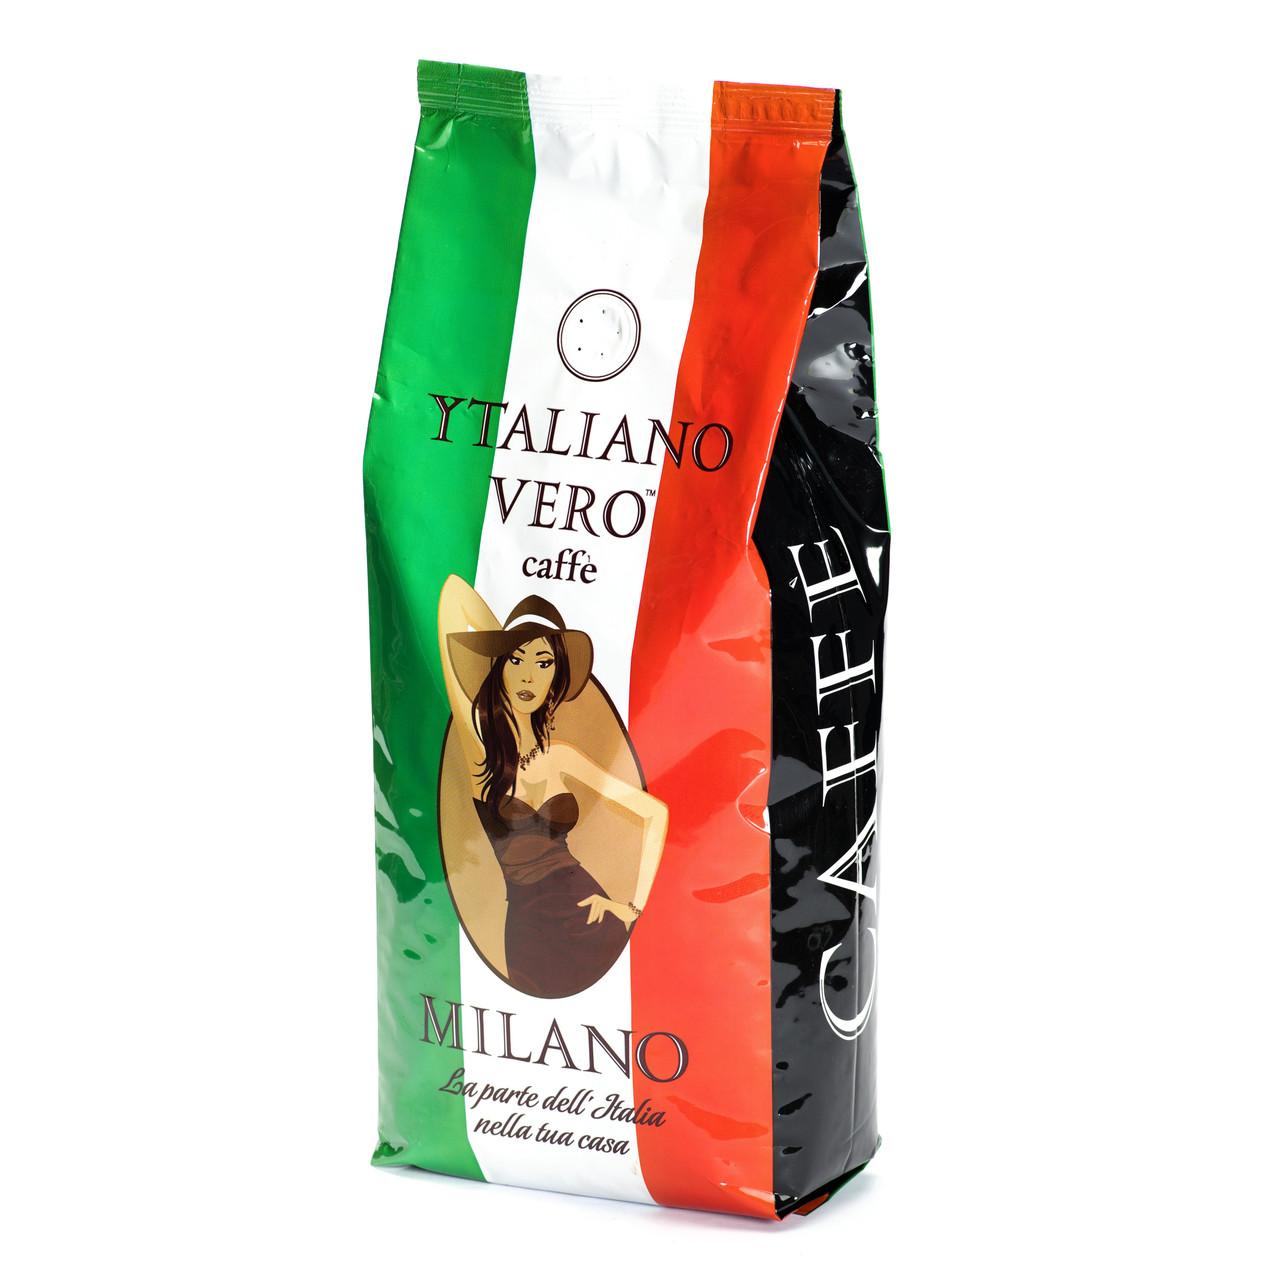 Кофе зерновой Italiano Vero Milano